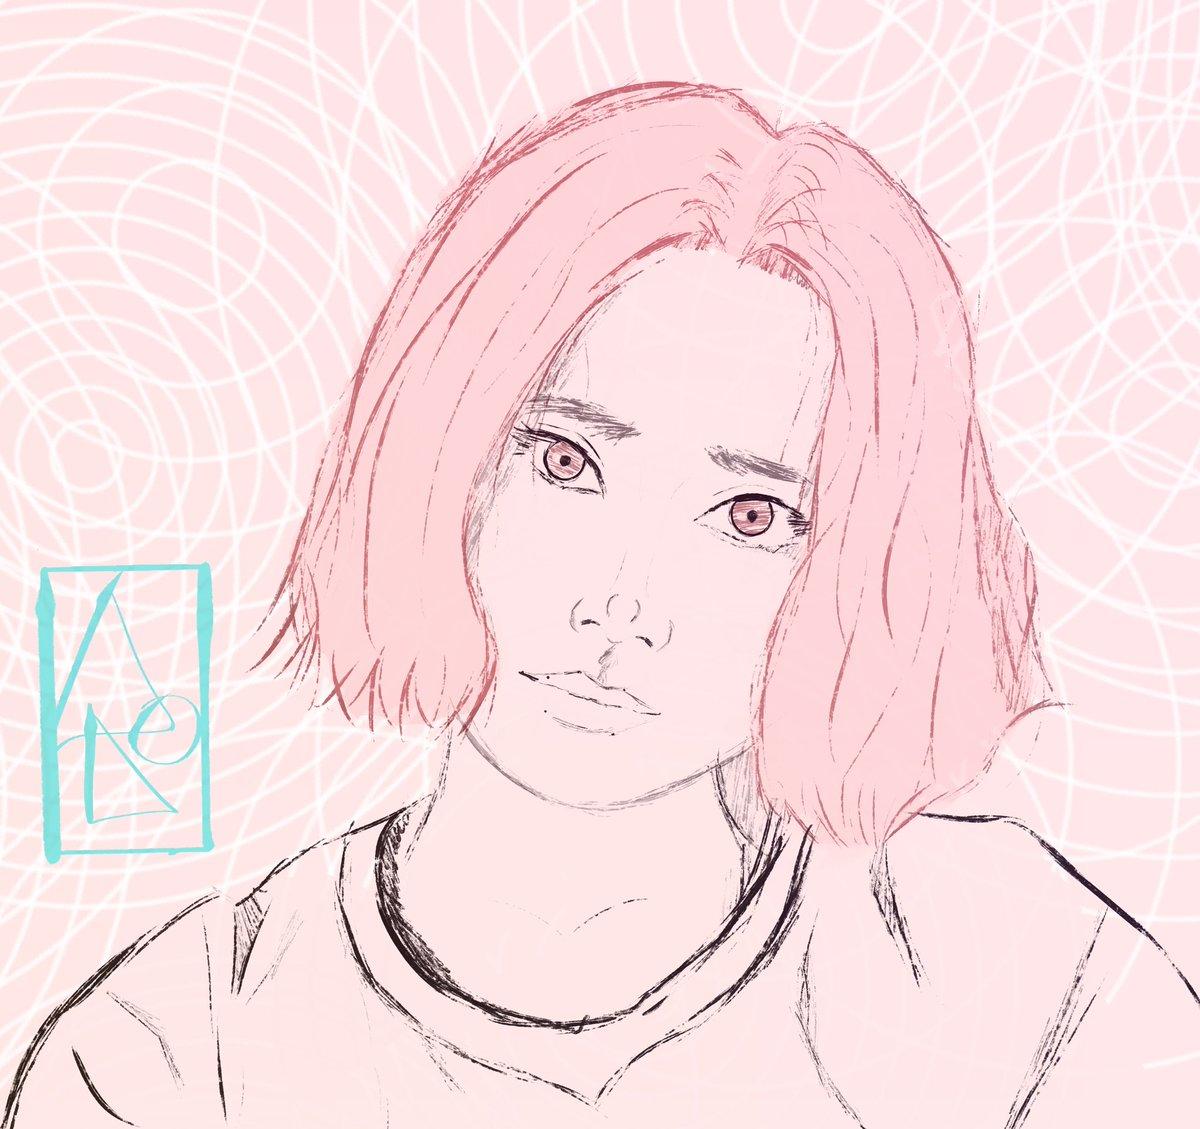 Wat do u think? Let me know uwu Plz i need frends( TДT)  #ArtistOnTwitter #Artist #myart #creative #doodle #drawing #draw #drawthisinyourstyle #sketchbook #DigitalArtist #Friends #discord #dailyart #SpotlightSunday #artofdoe https://t.co/XEglEOqUjn